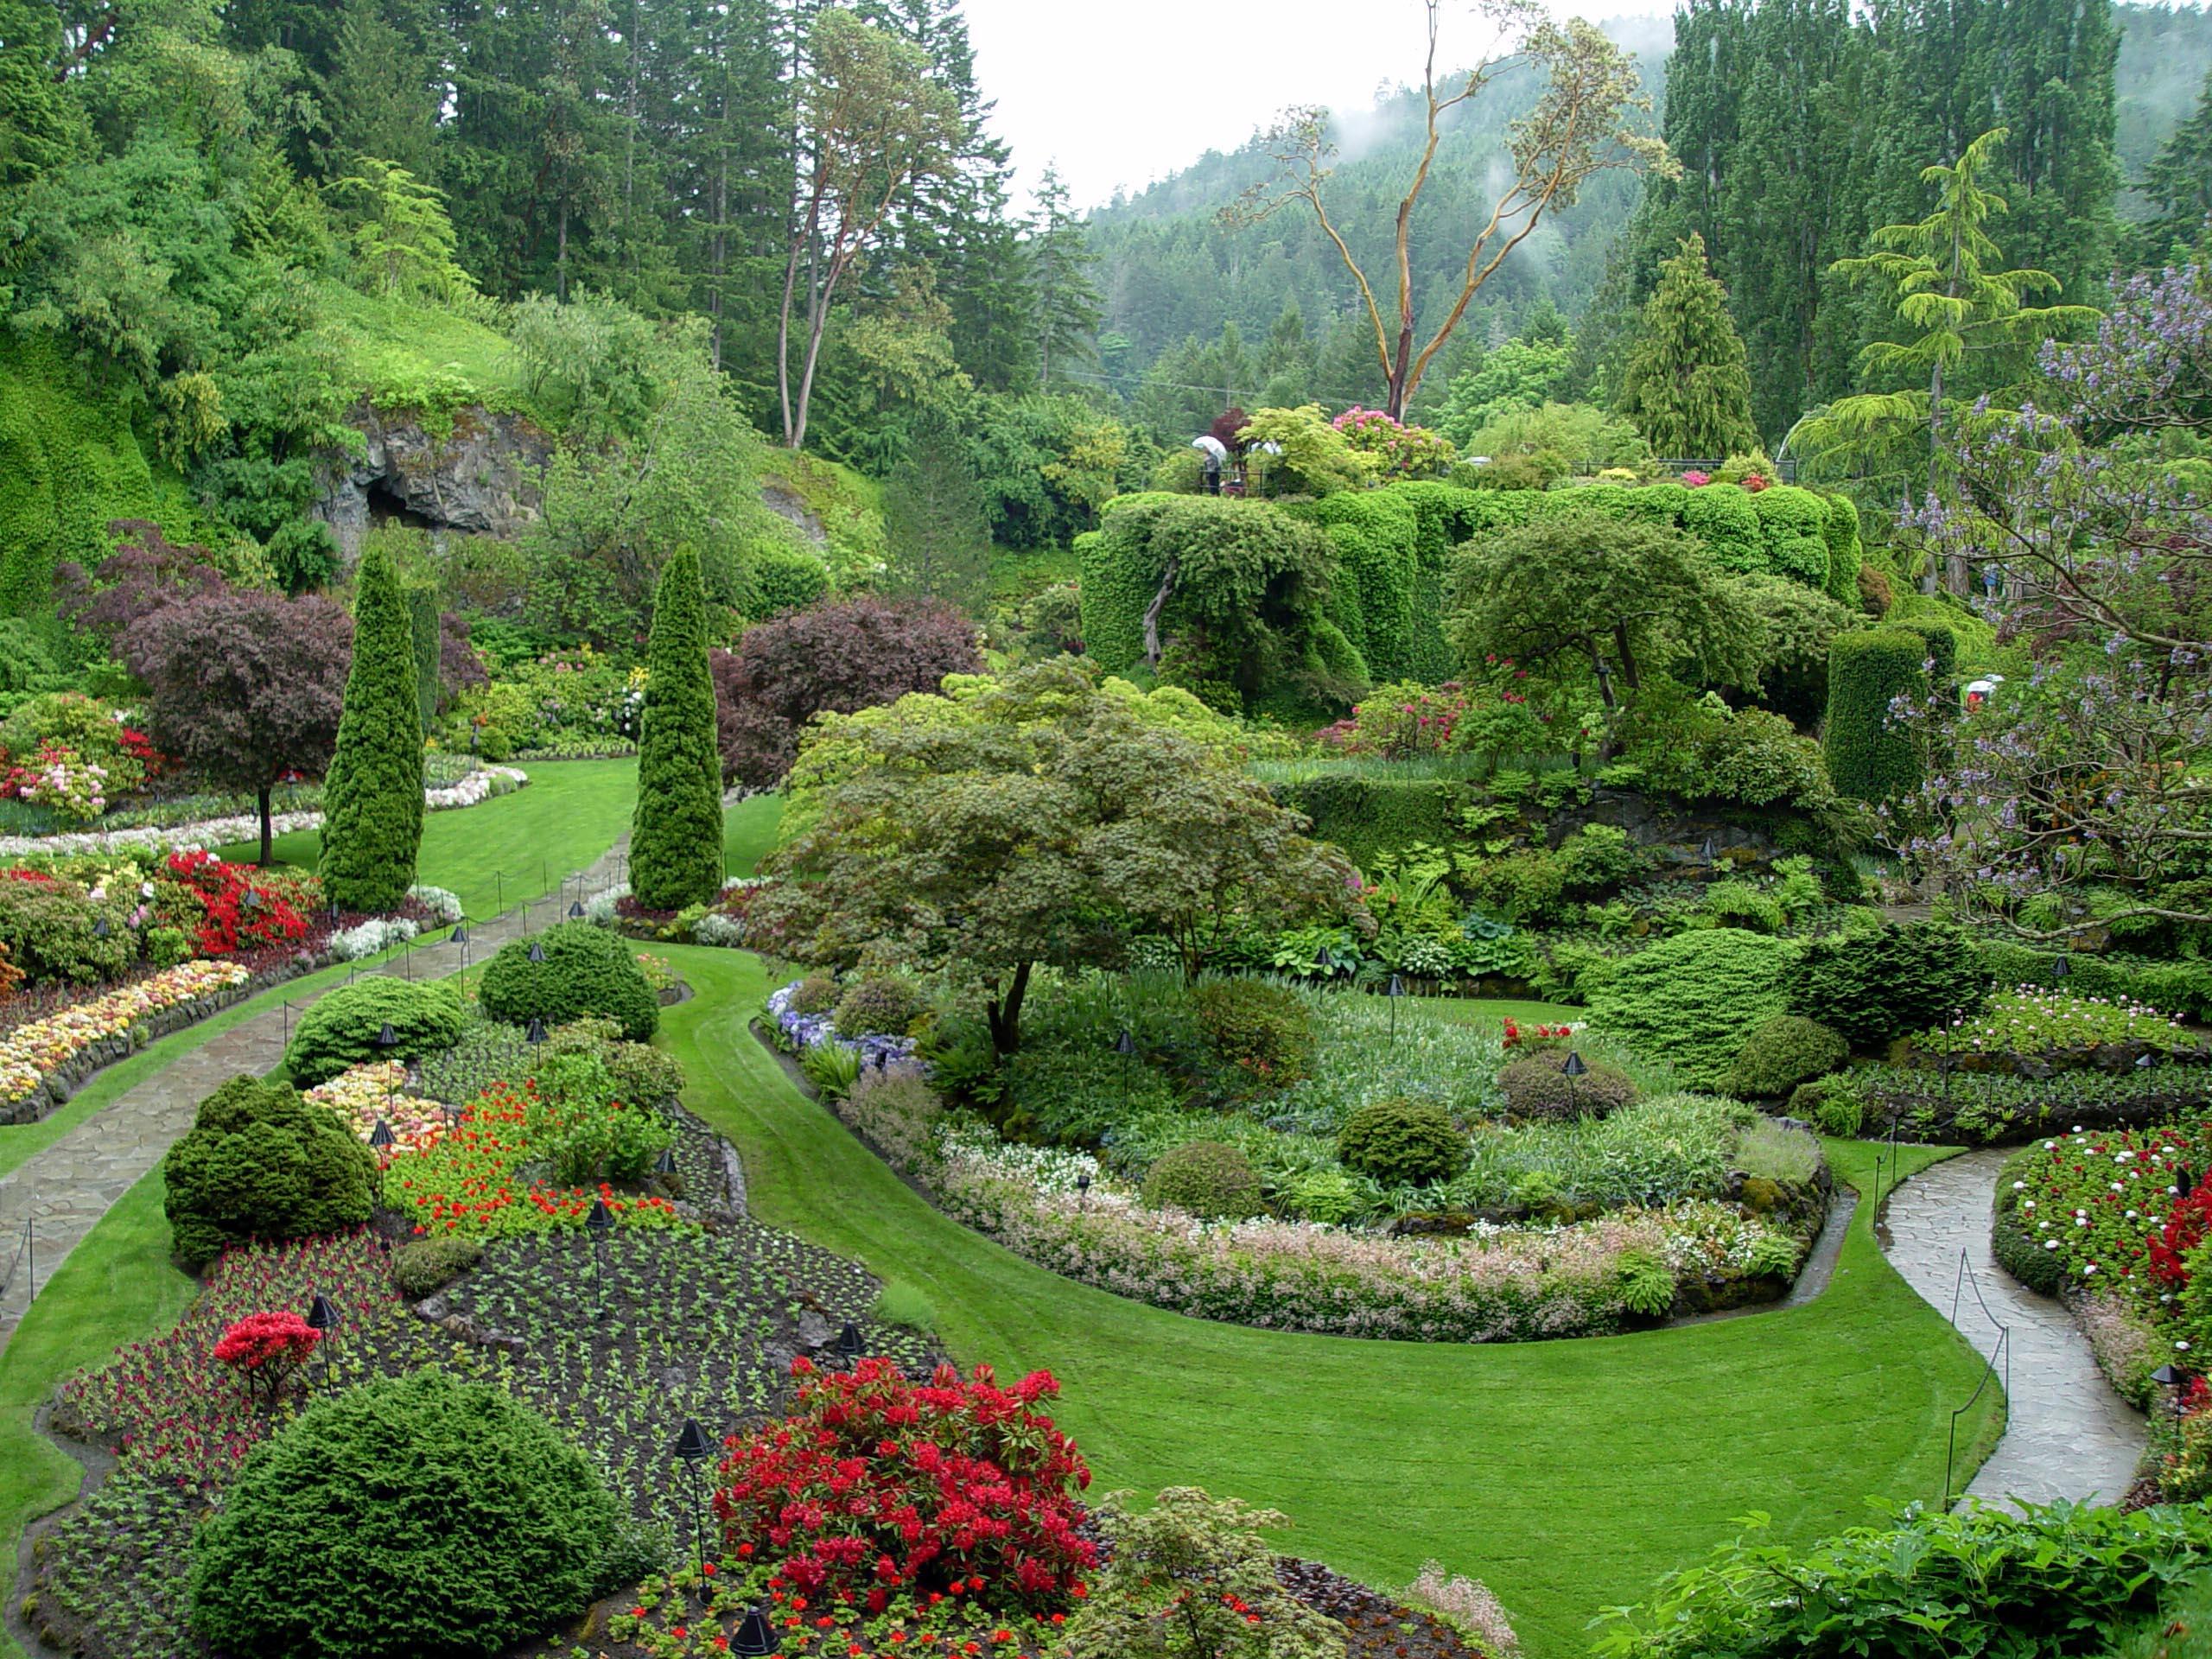 Garden Housecalls Garden Sitting Places